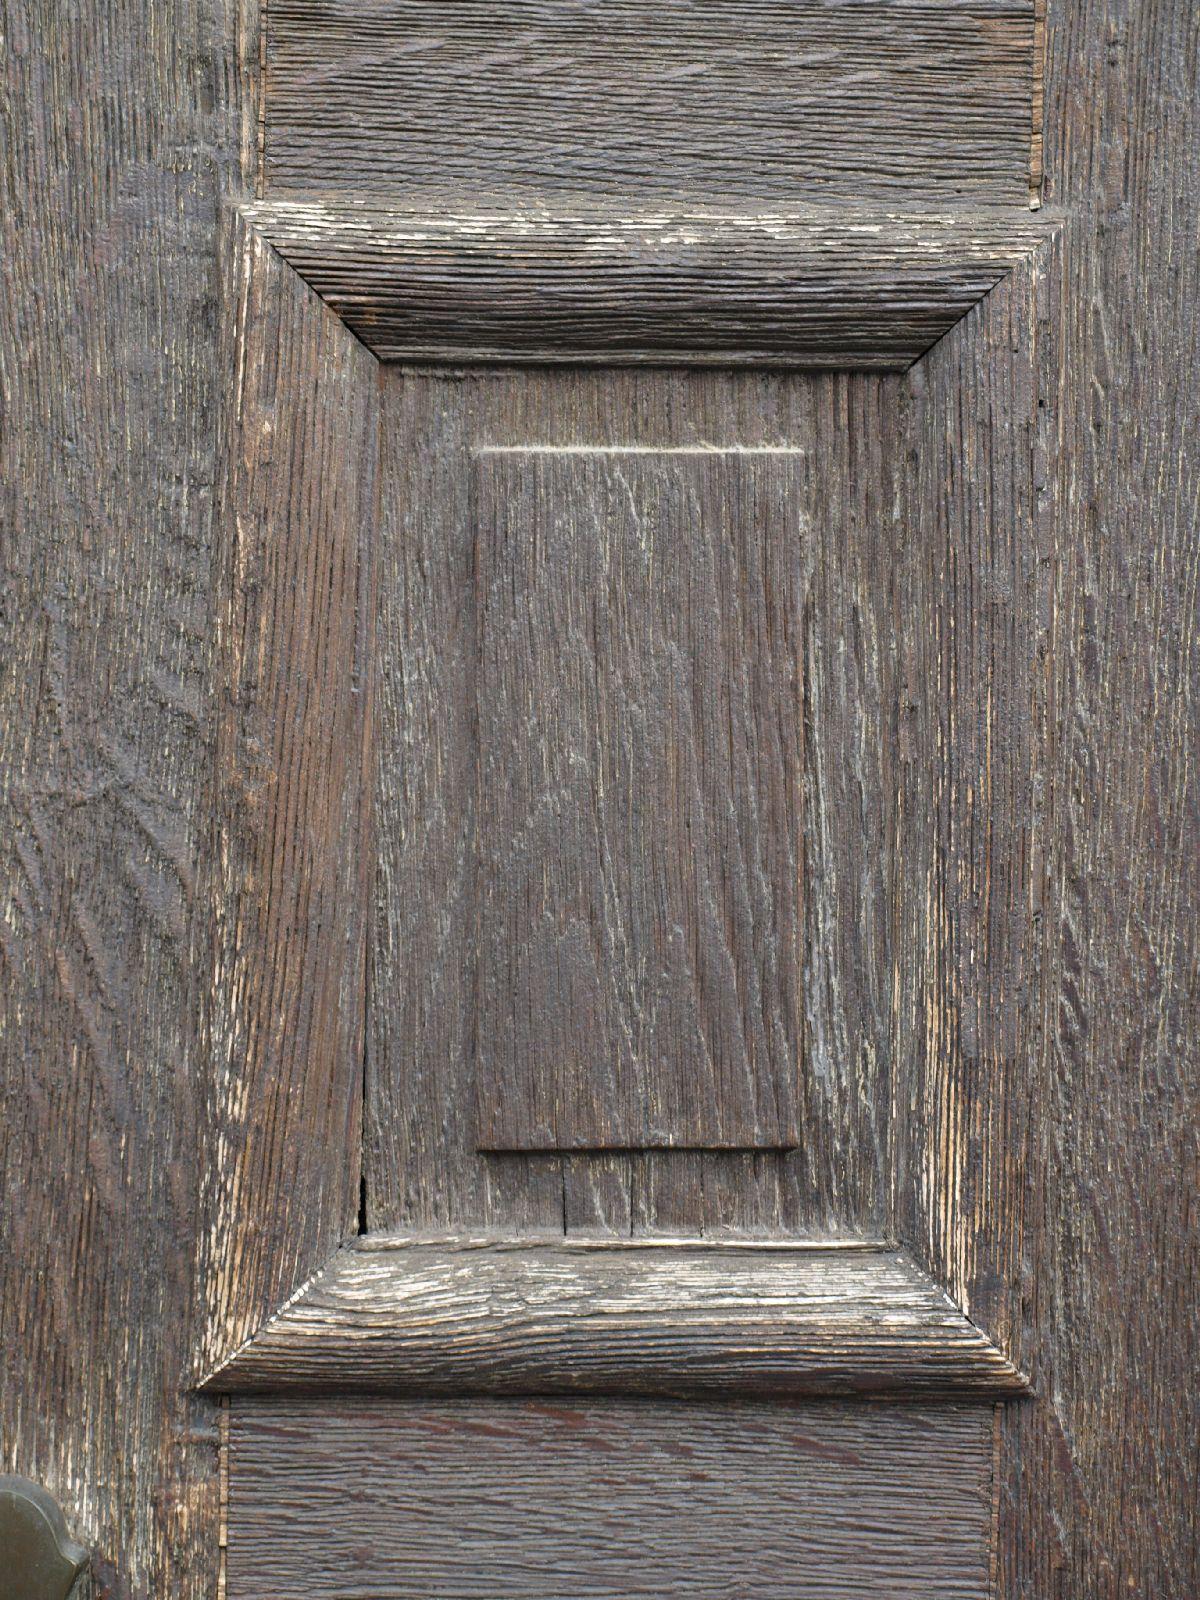 Wood_Texture_A_P6213555